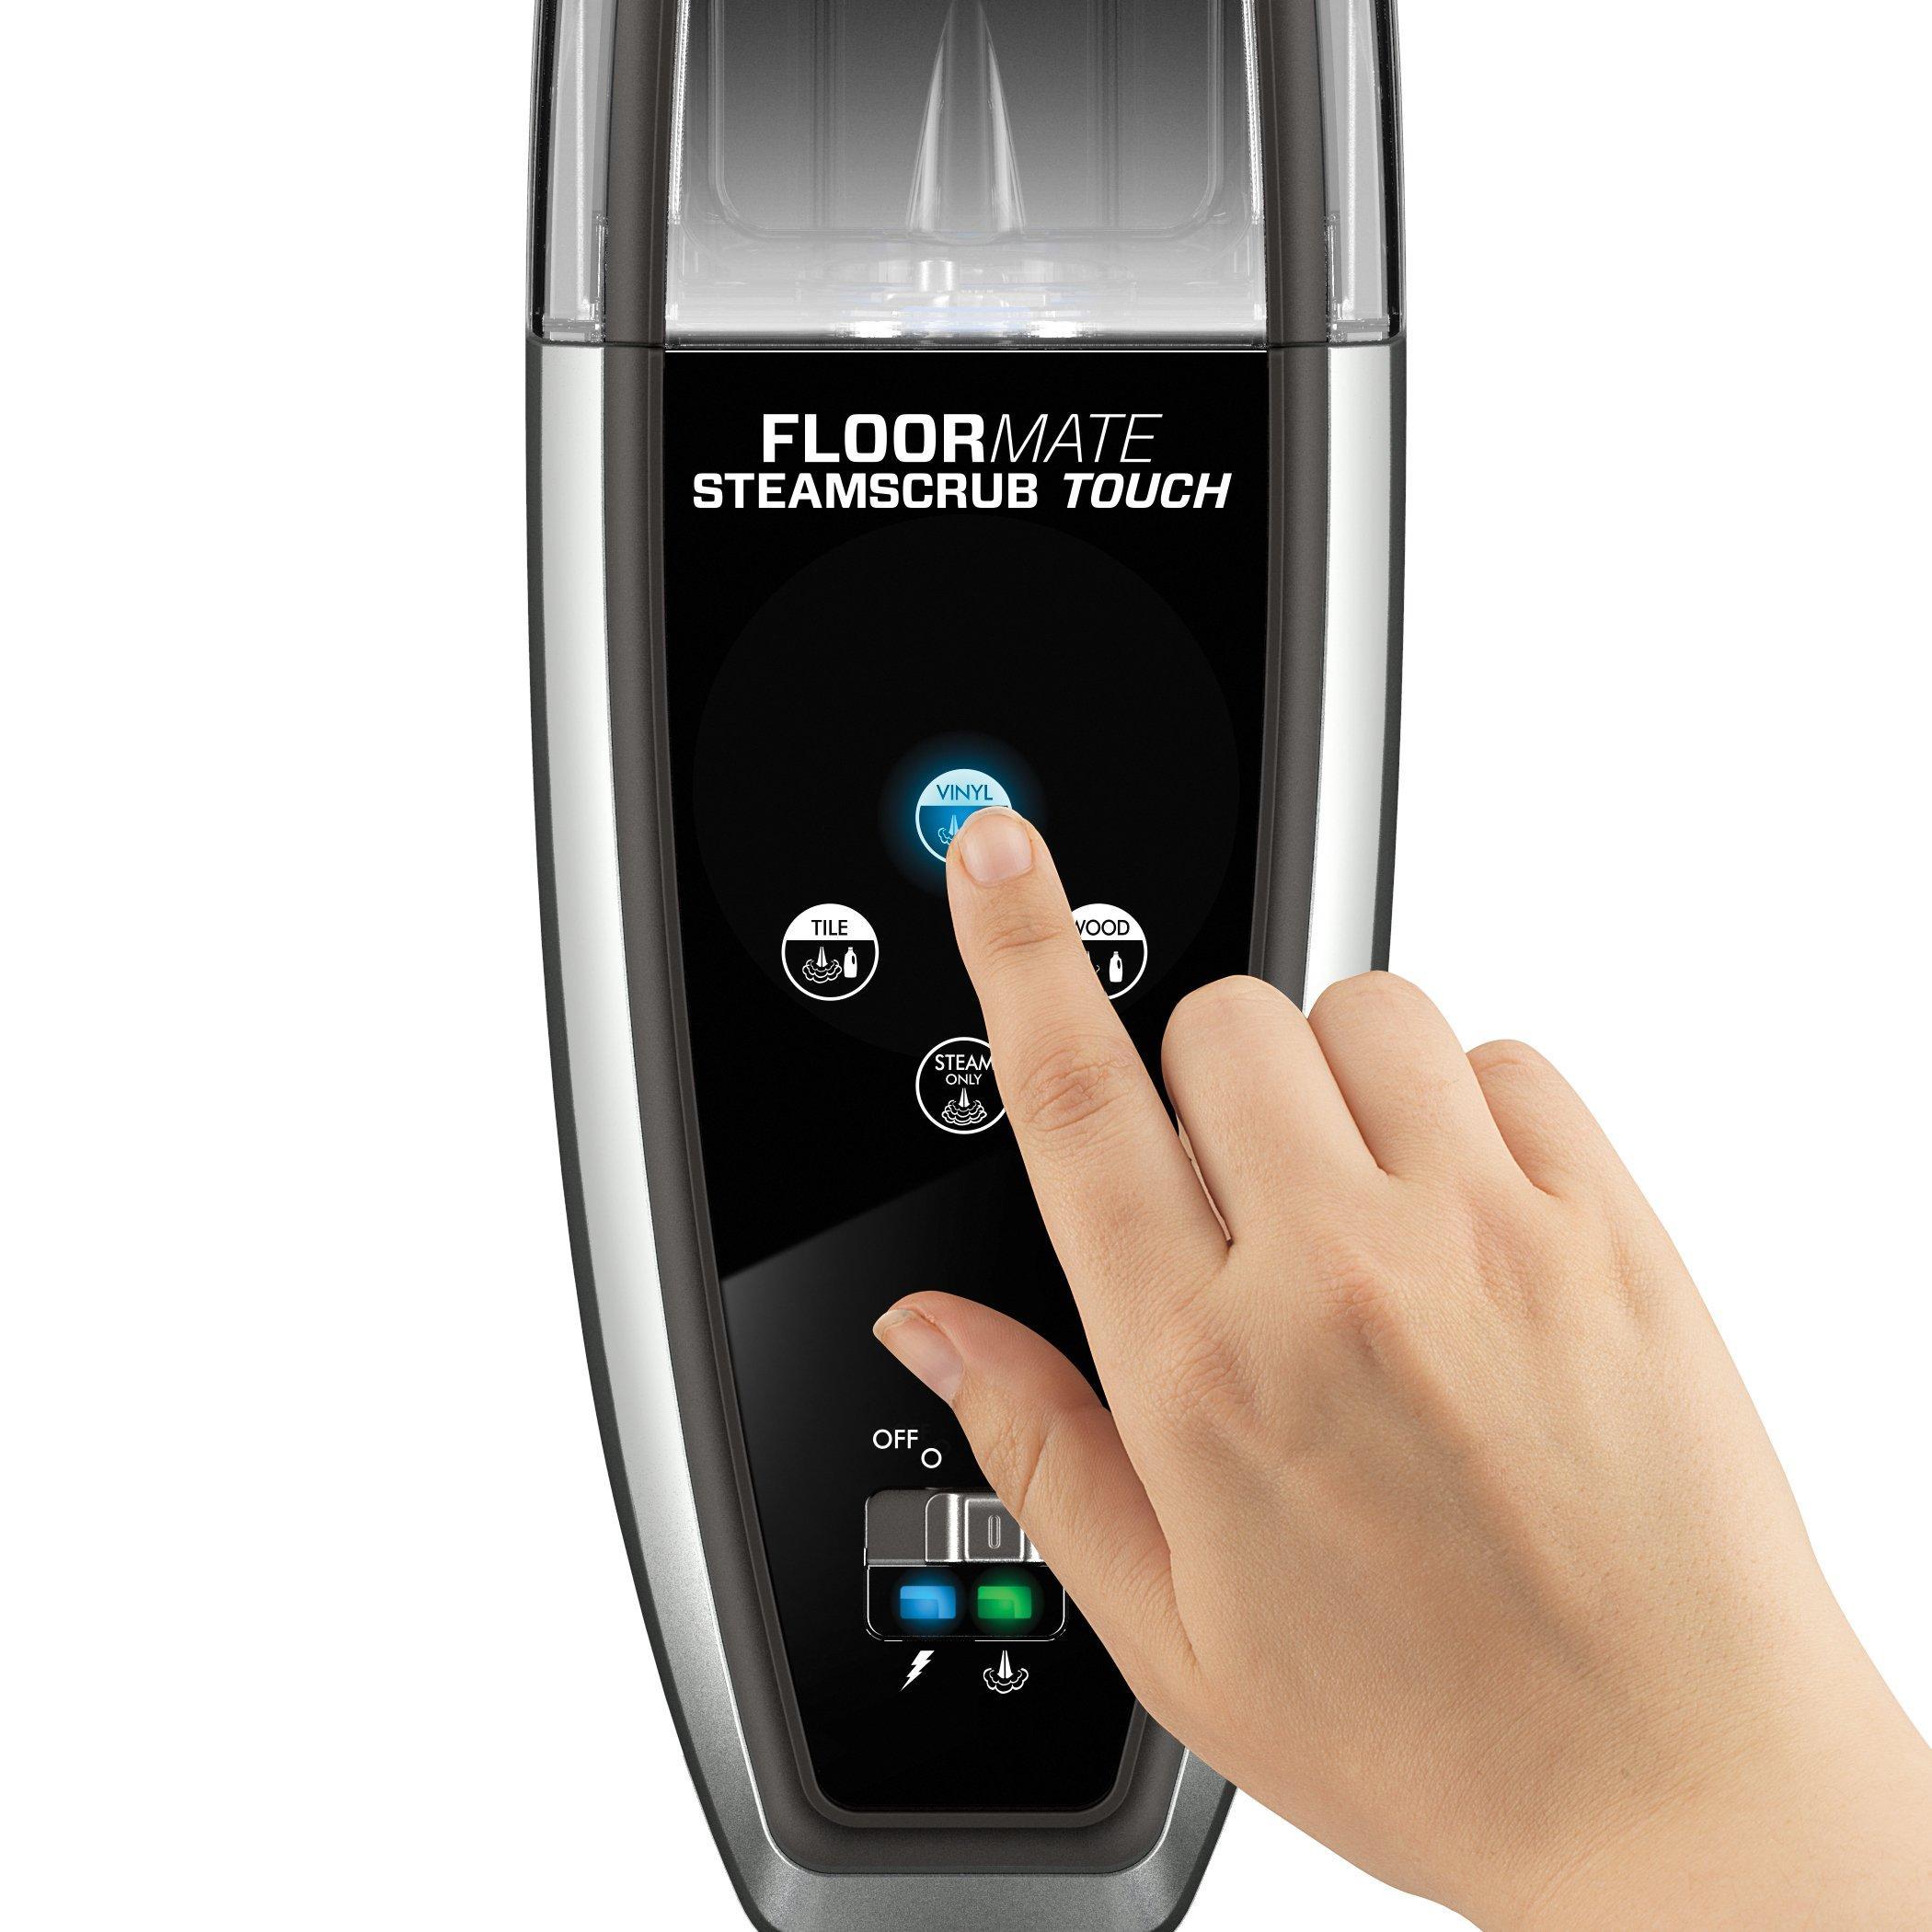 FloorMate SteamScrub Touch Steam Cleaner Mop8